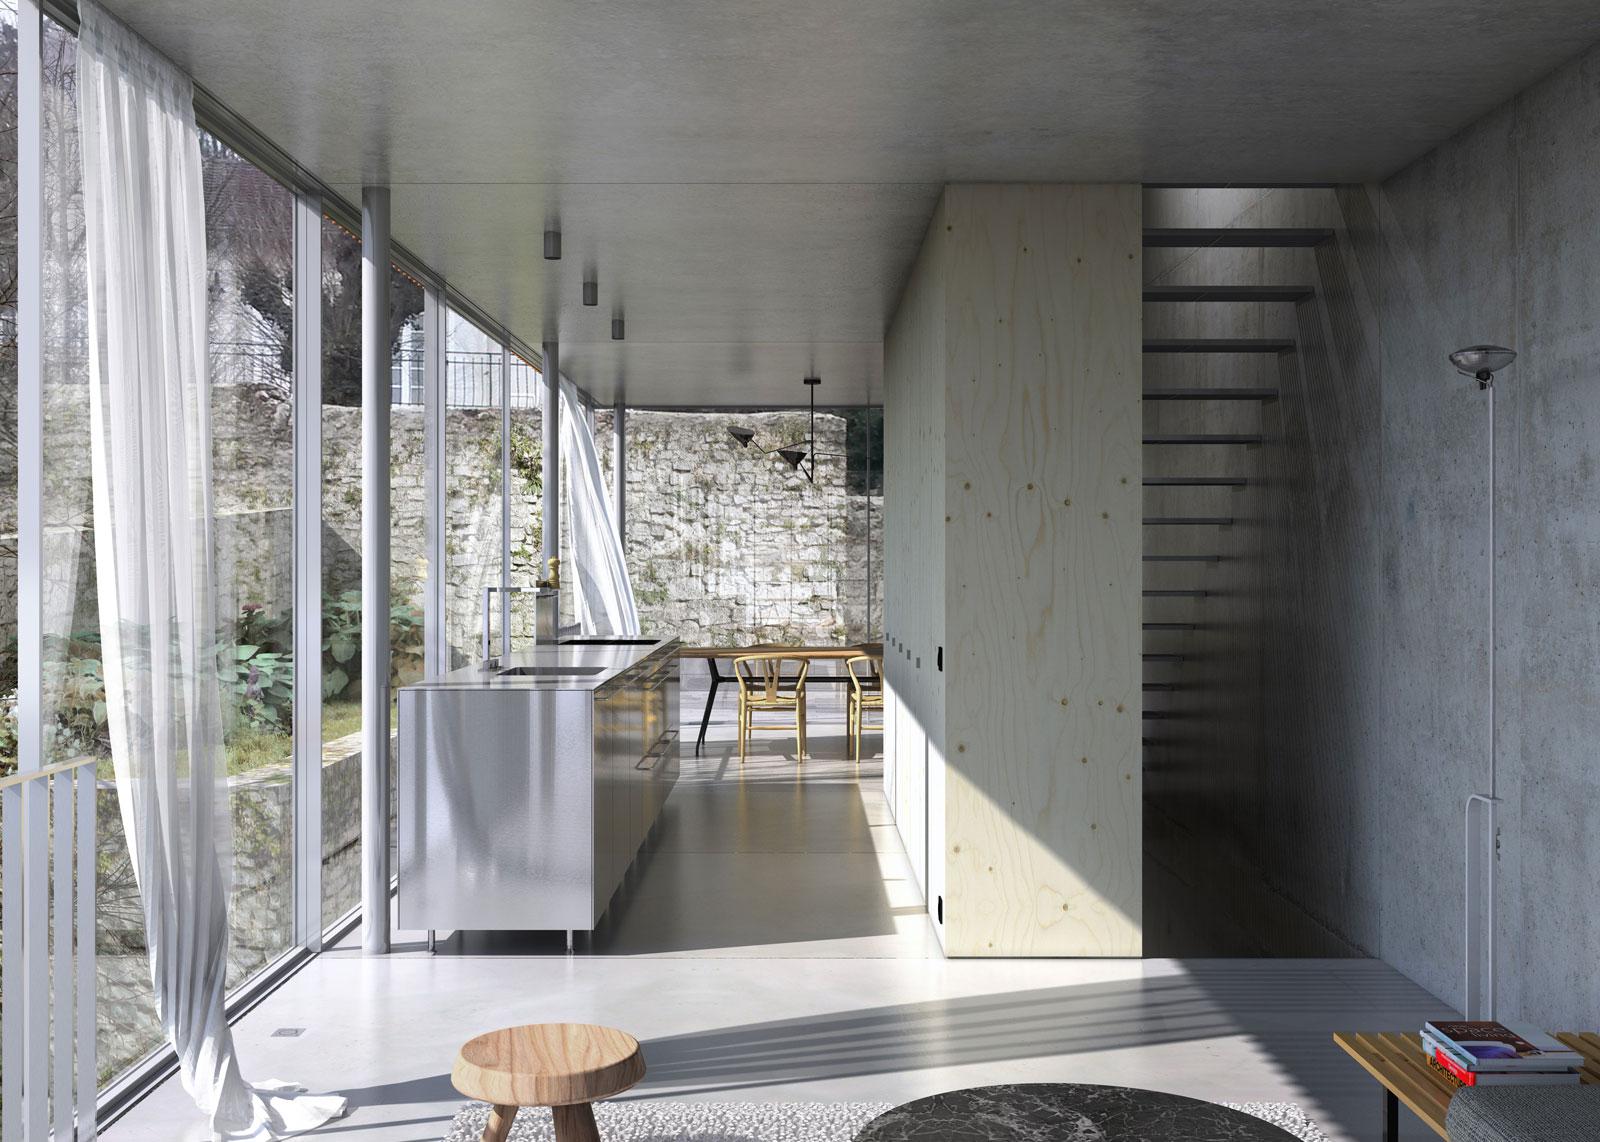 maison G - heros architecture maison G Cheuvreuse